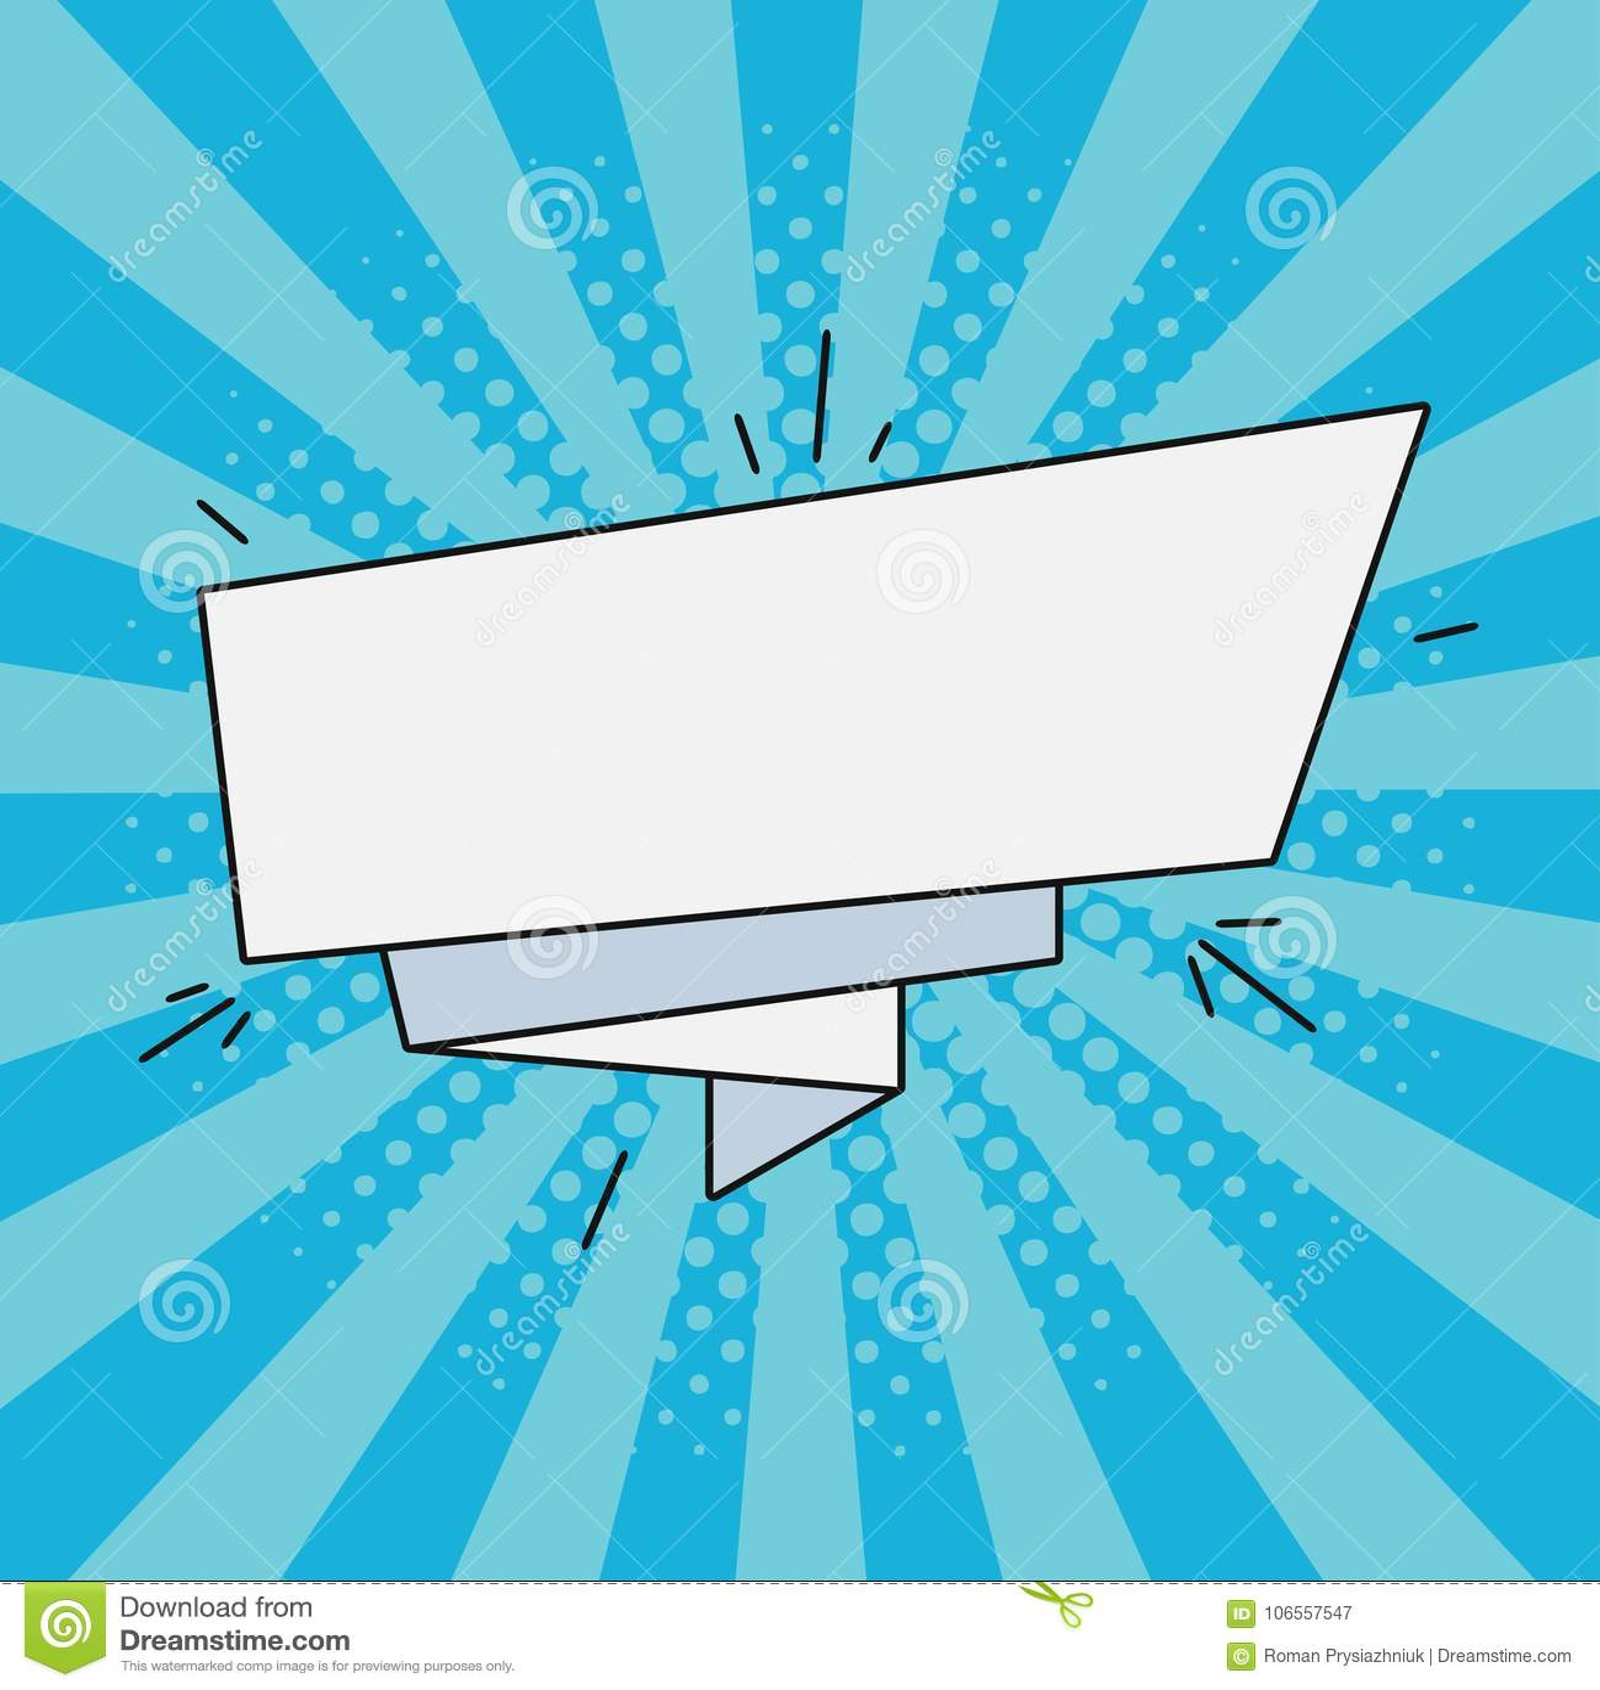 Bandera de papel cómica para el texto Burbuja vacía retra del discurso, etiqueta de la historieta Ejemplo en estilo del arte pop